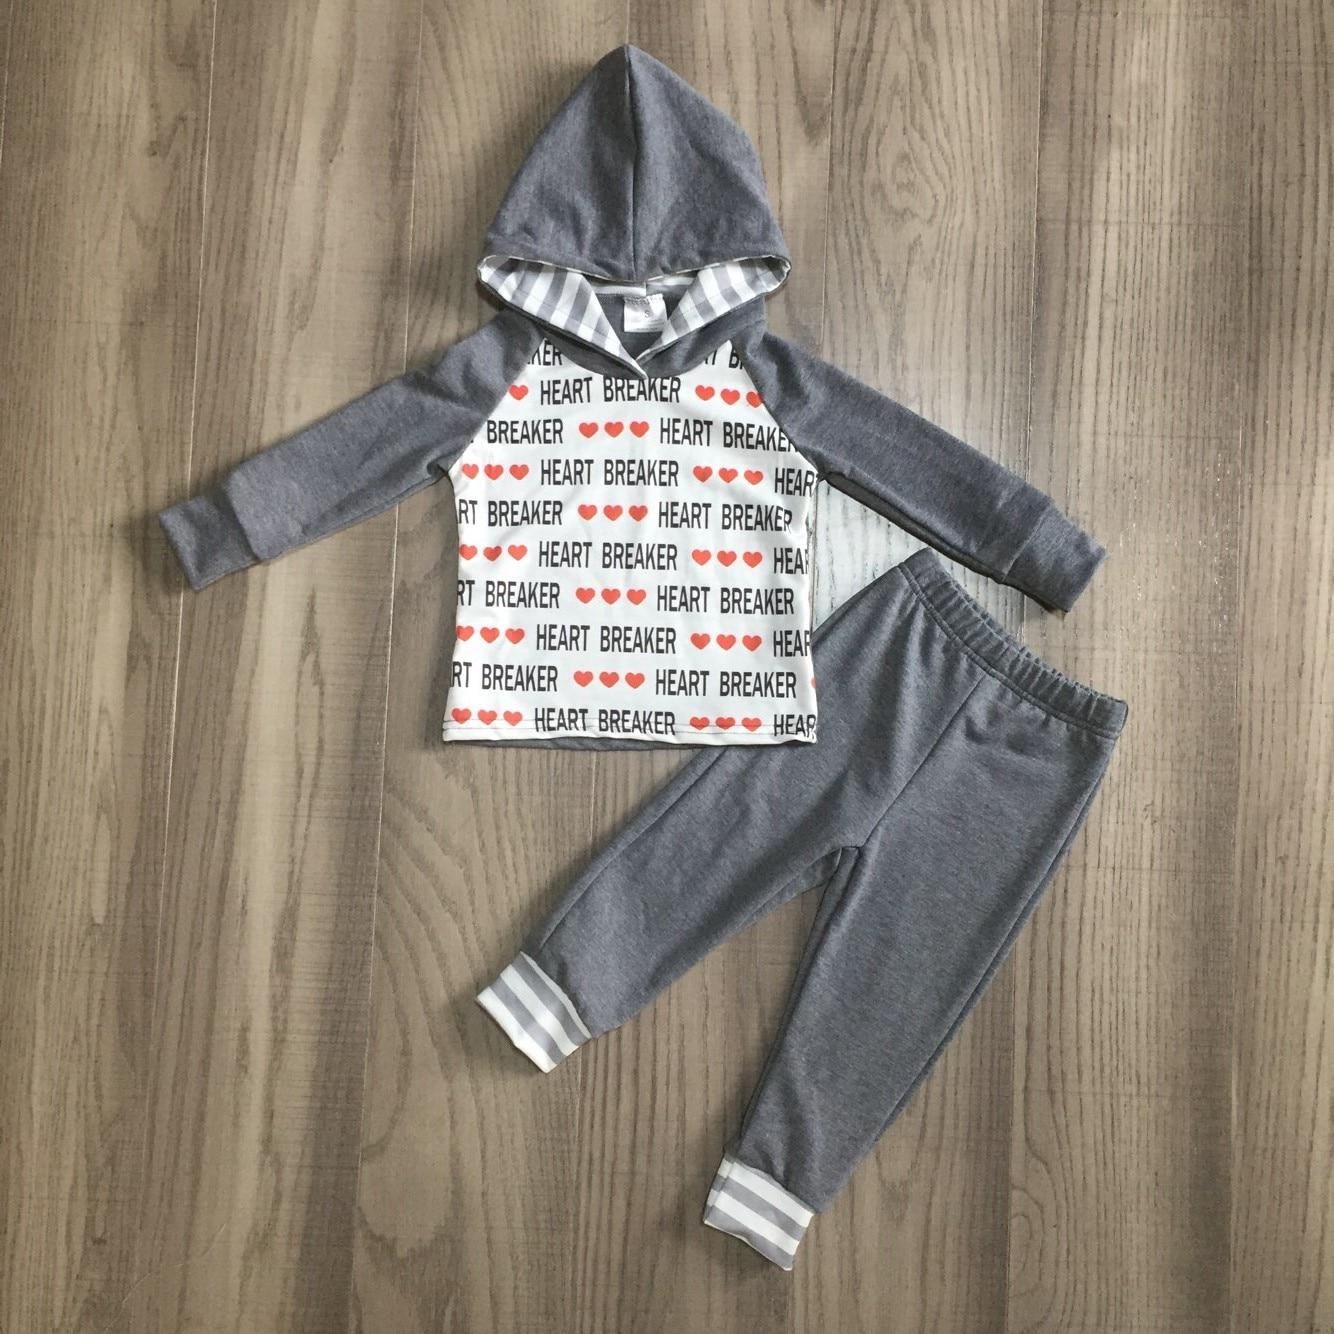 Girlymax Valentine's Day Winter Baby Boys Cotton Heart Breaker Homewear Hoodie Children Clothes Loungewear Outfits Boutique Set 1